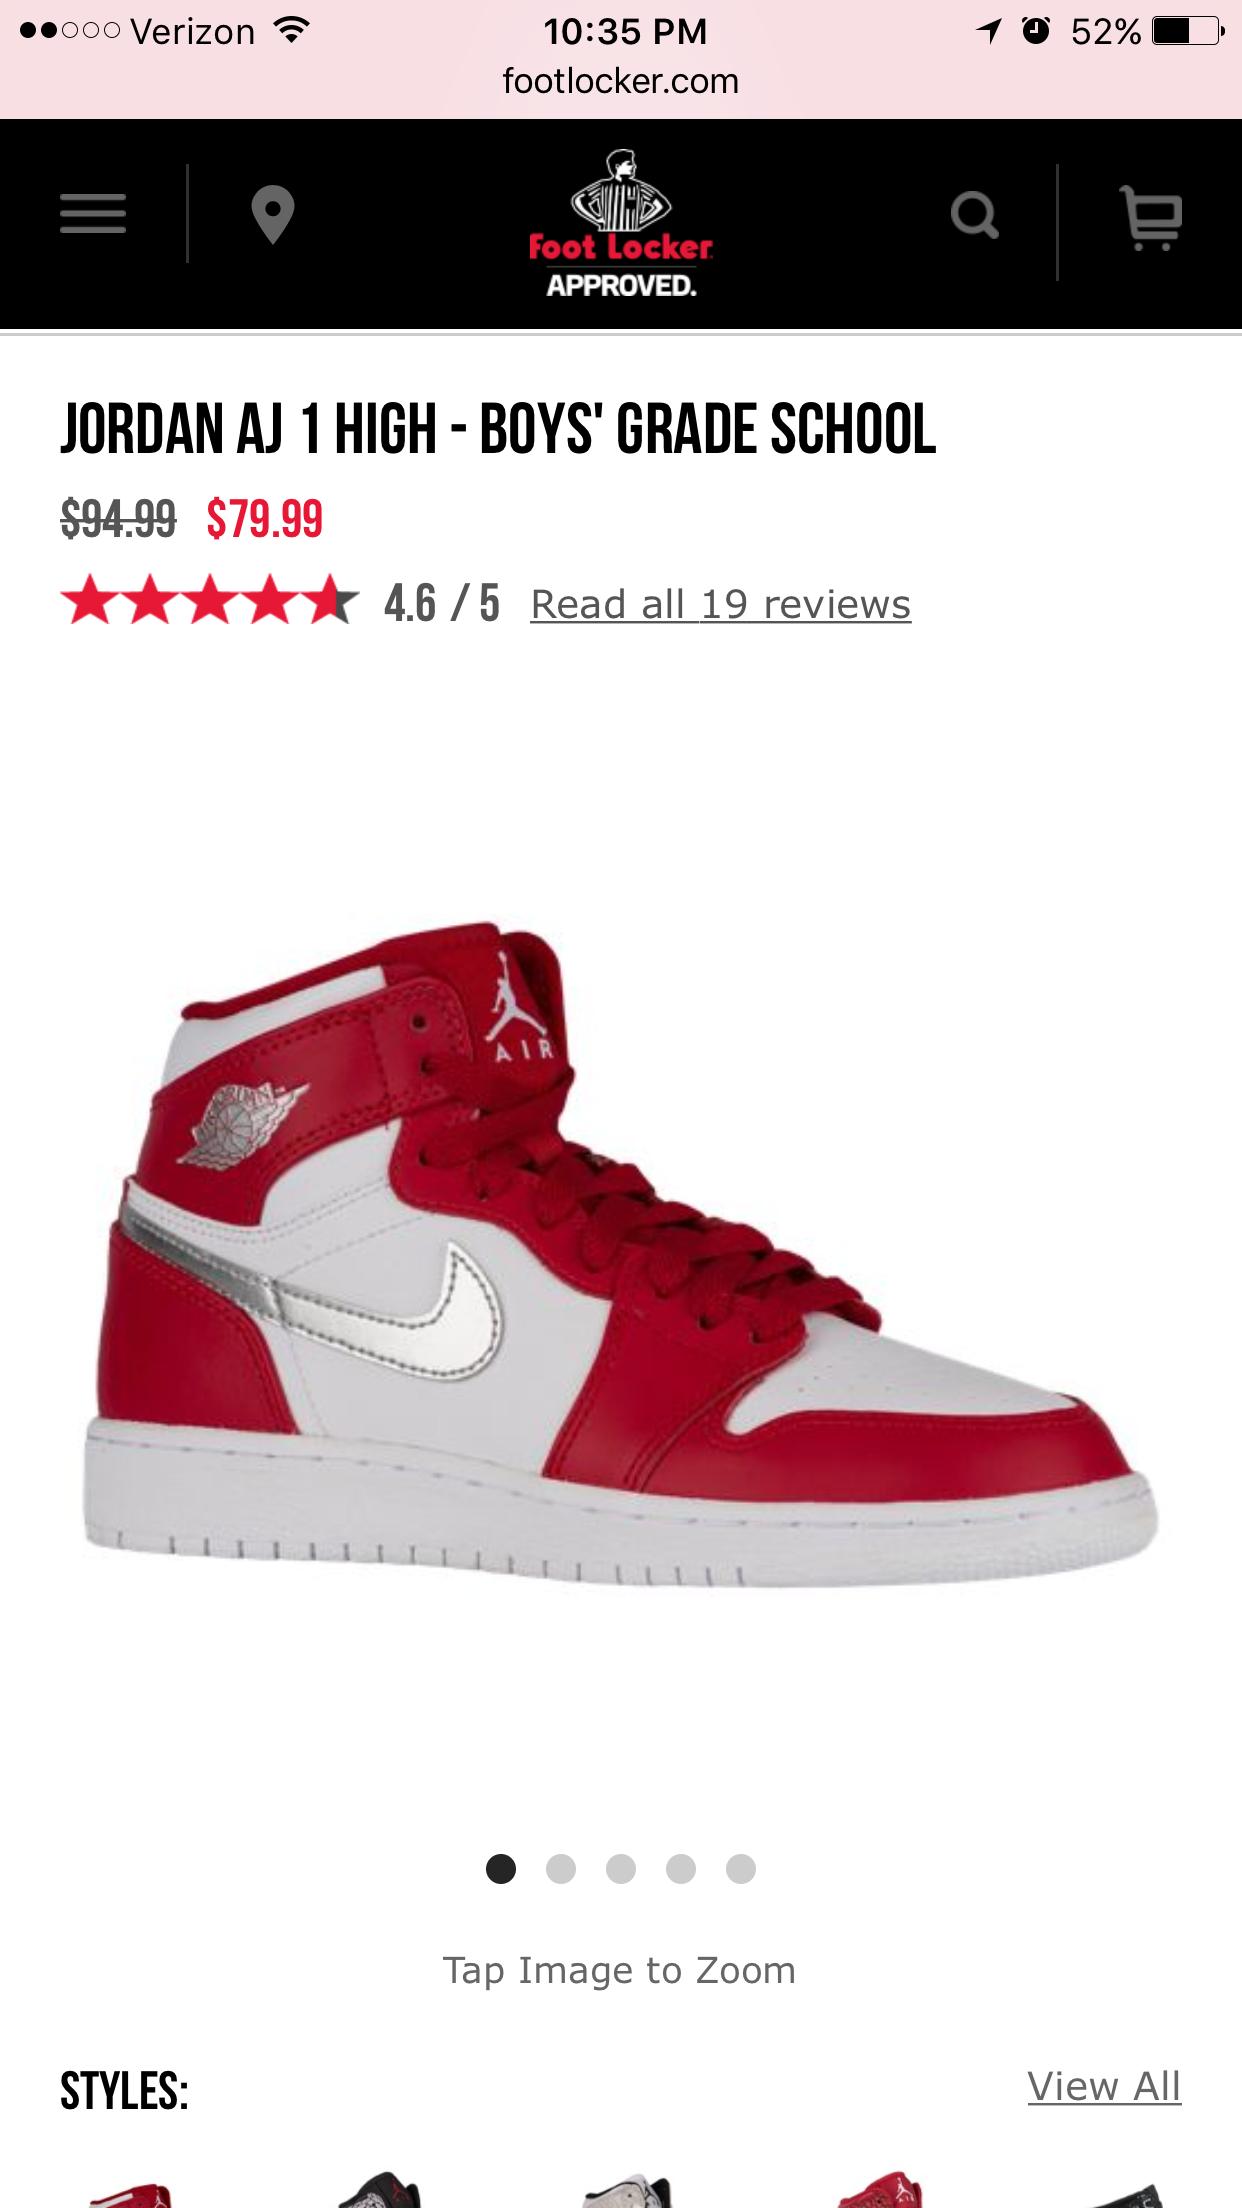 Air Jordan ShoesJordan Shoes For MenNike Air Jordan 6Nike Shoes For  BoysJordan TenisSneakers For GirlsNew Nike ShoesJordan Basketball ShoesCheap  Jordan ...